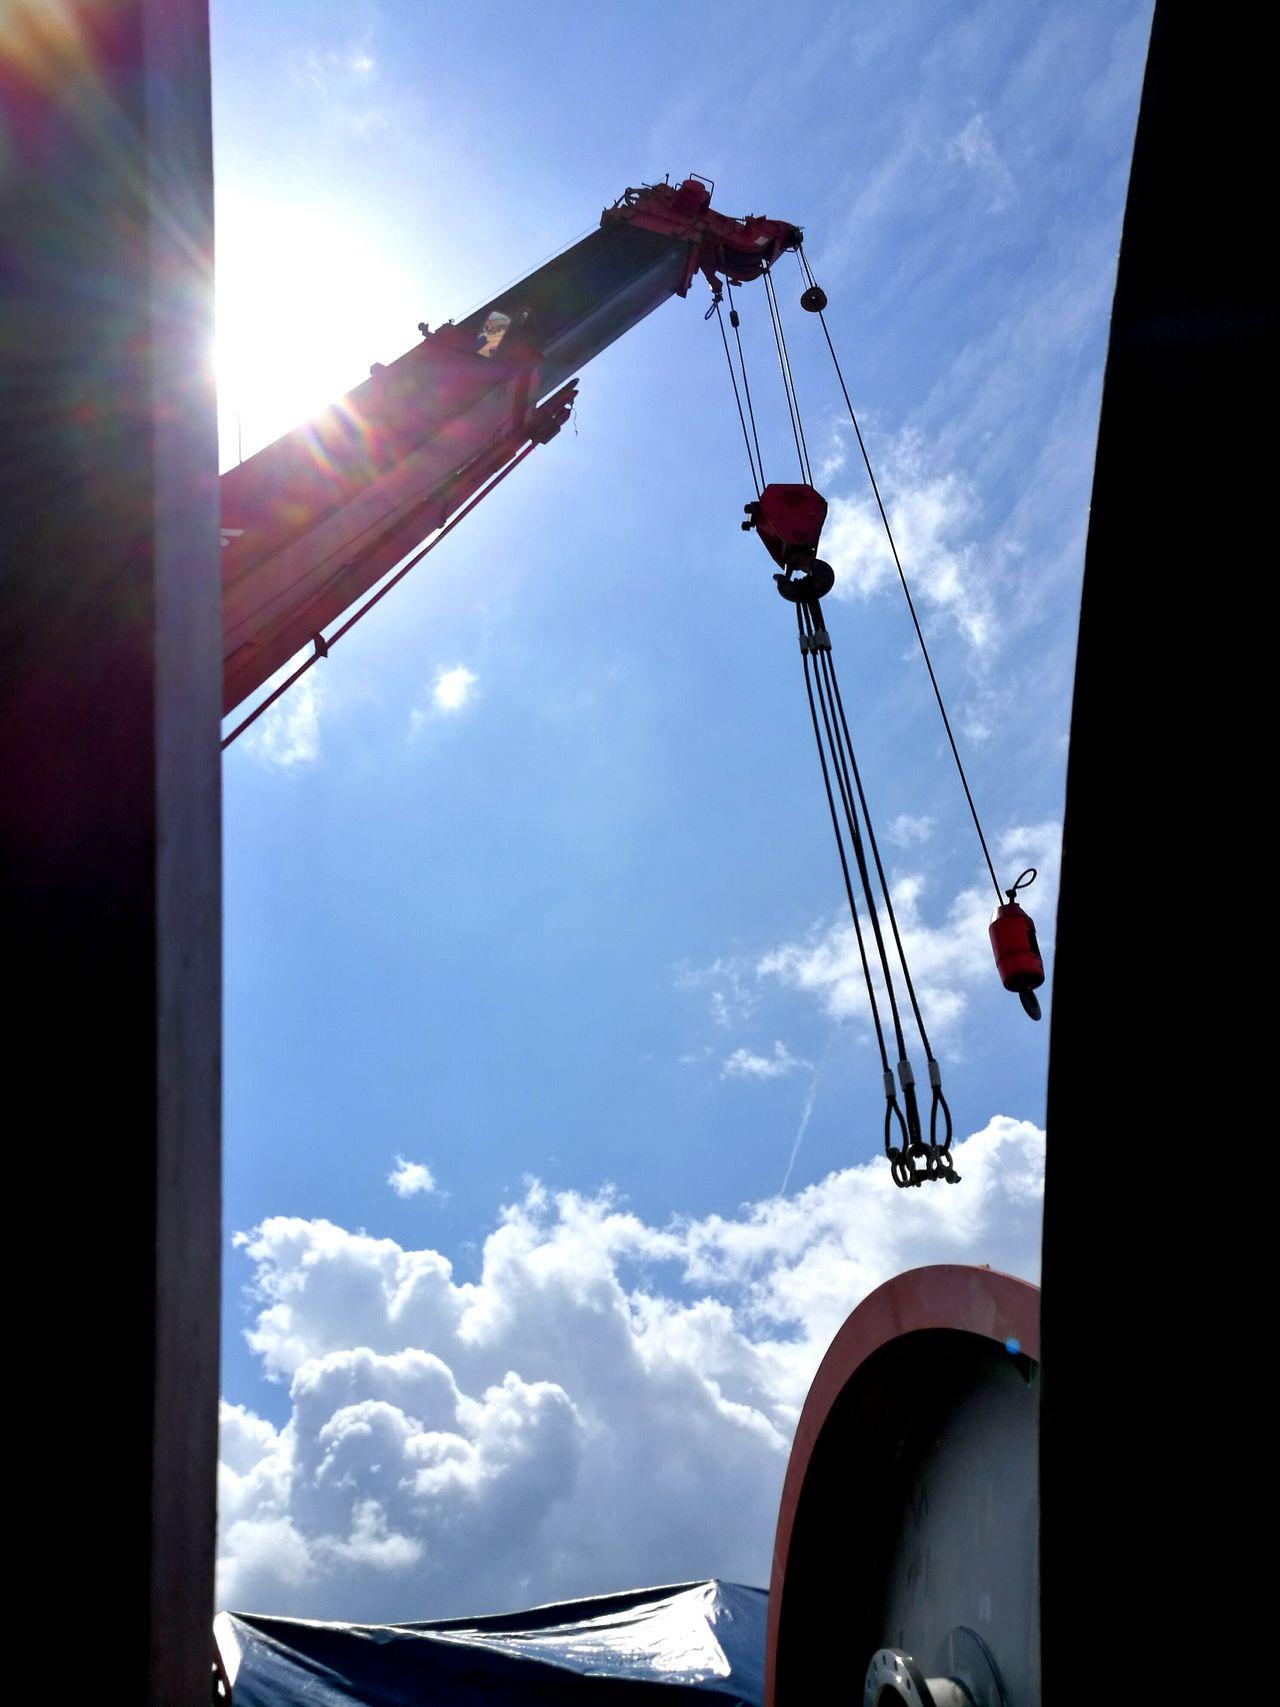 Sun Sky Outdoors Day Crane Lifting Construction Construction Site Transportation Work In Progress